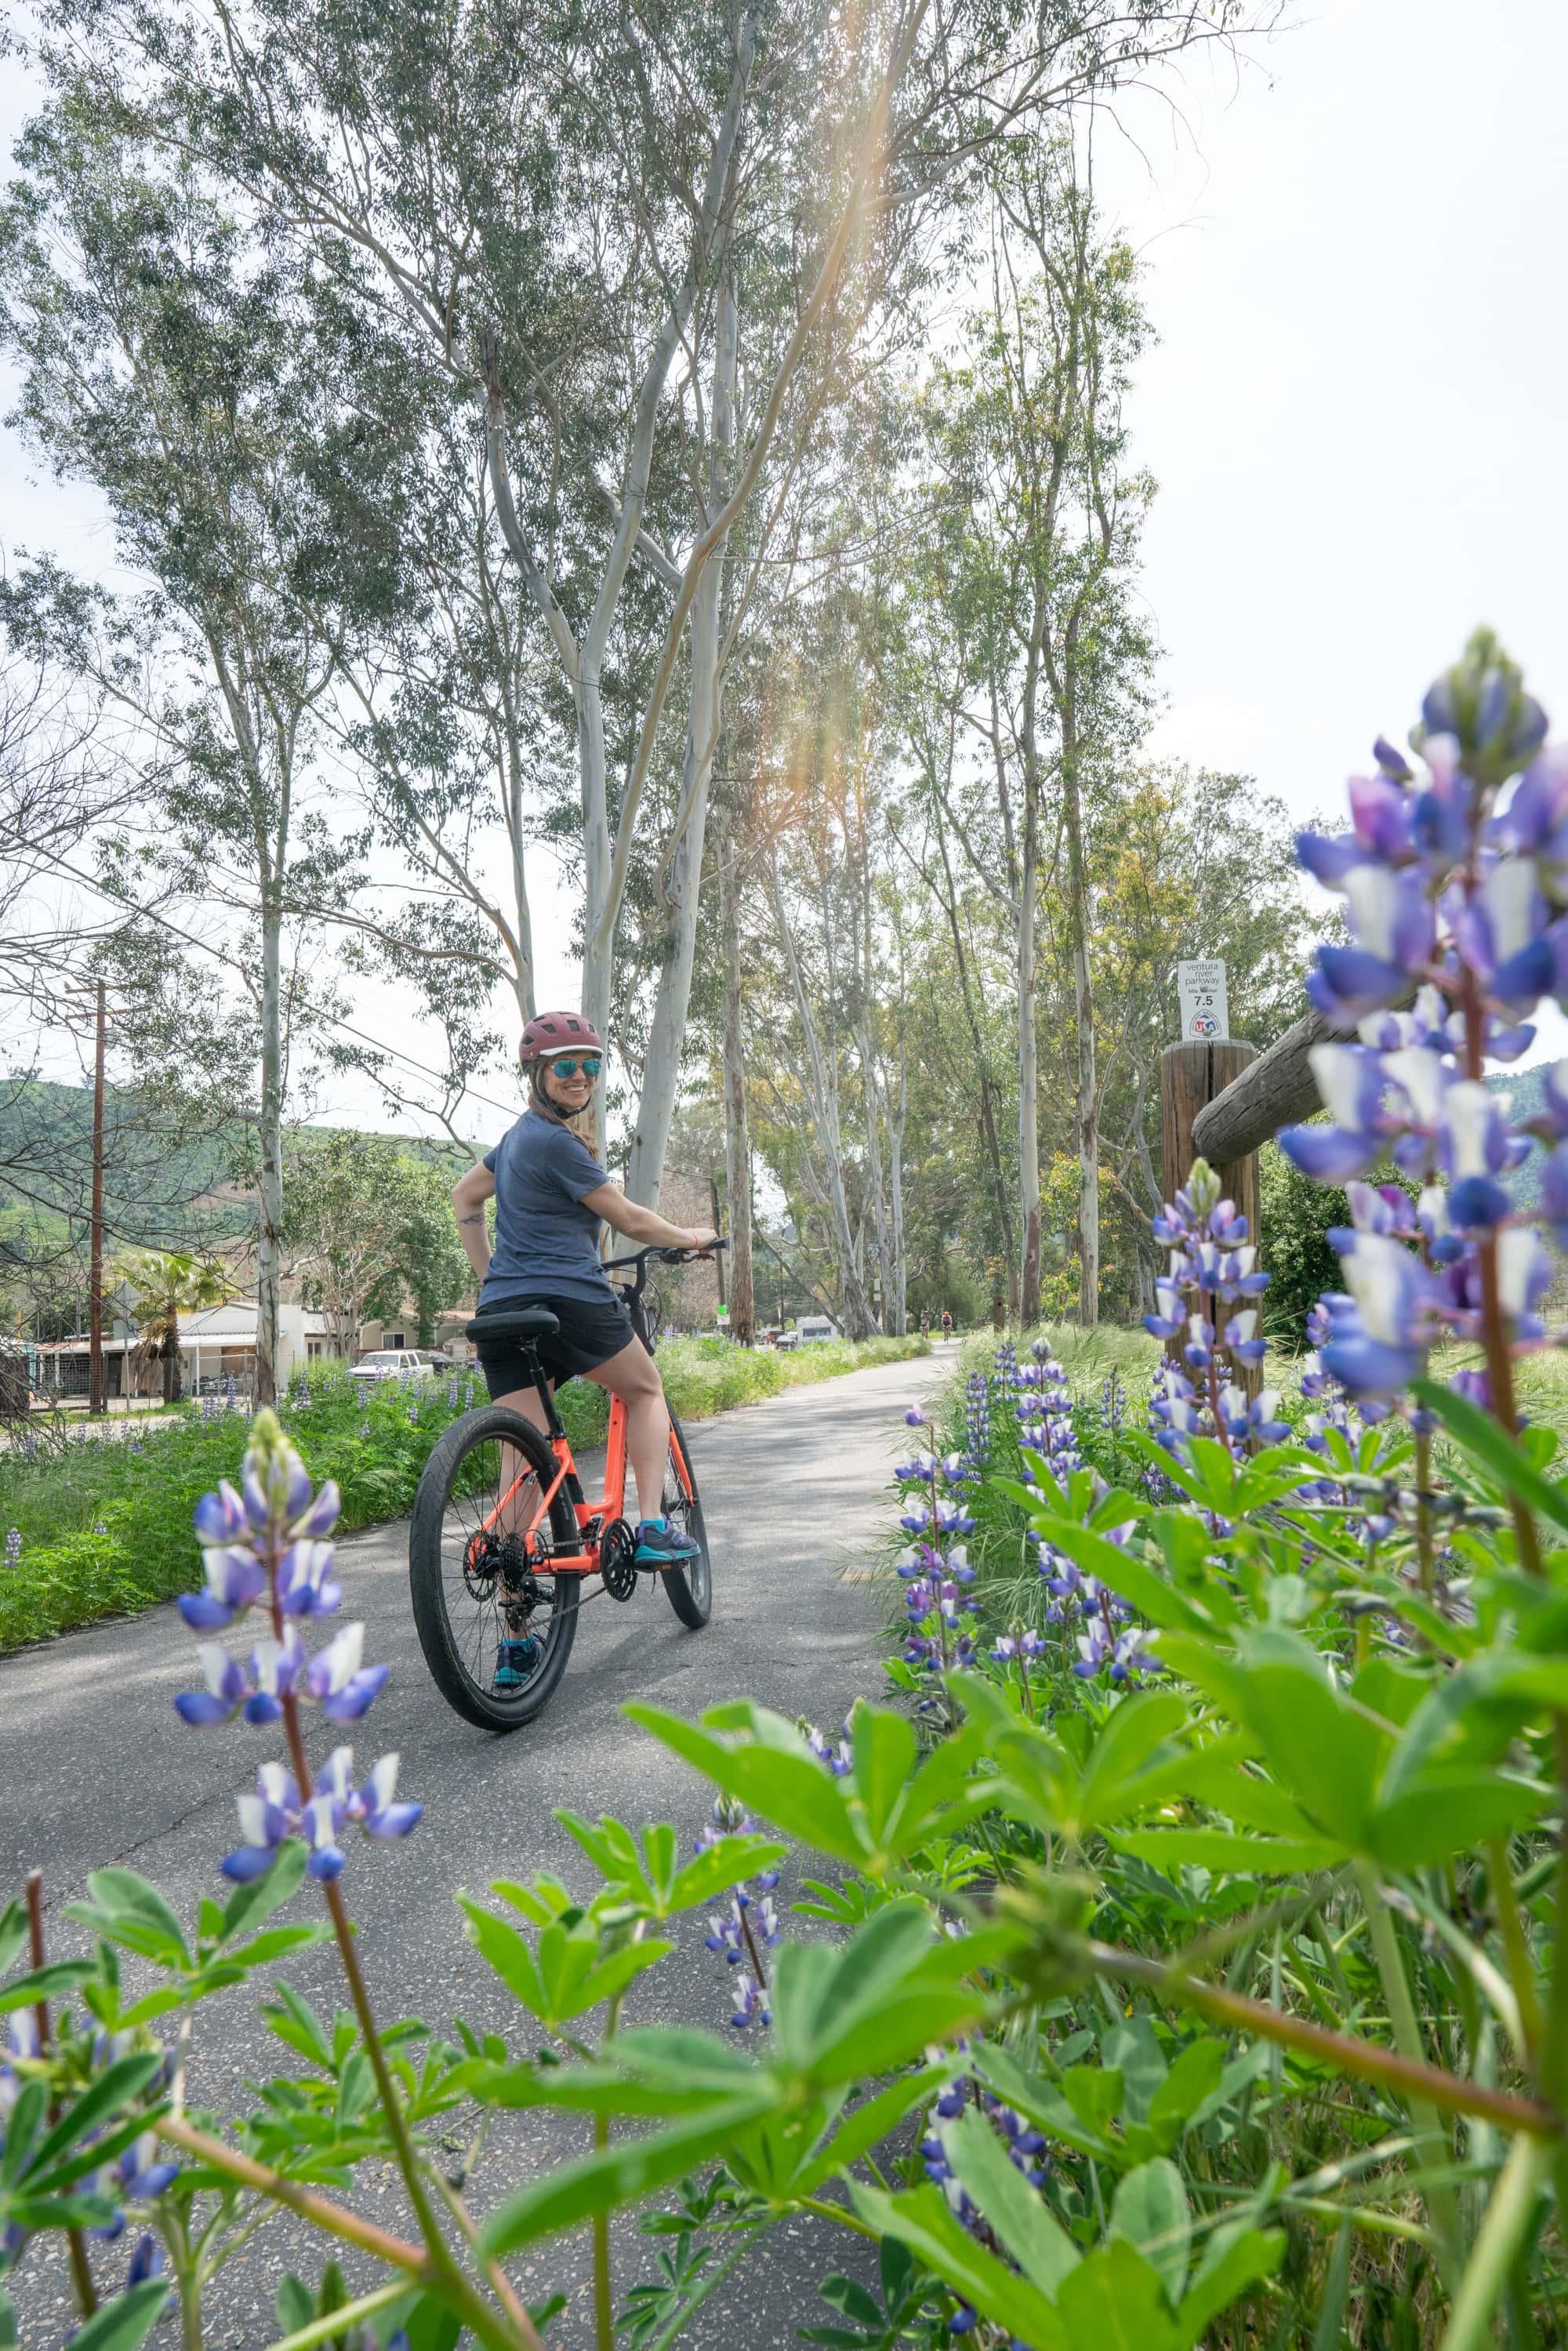 Ventura bike path // A 6 day california coast road trip itinerary that combines outdoor adventure travel and local California beach town culture.